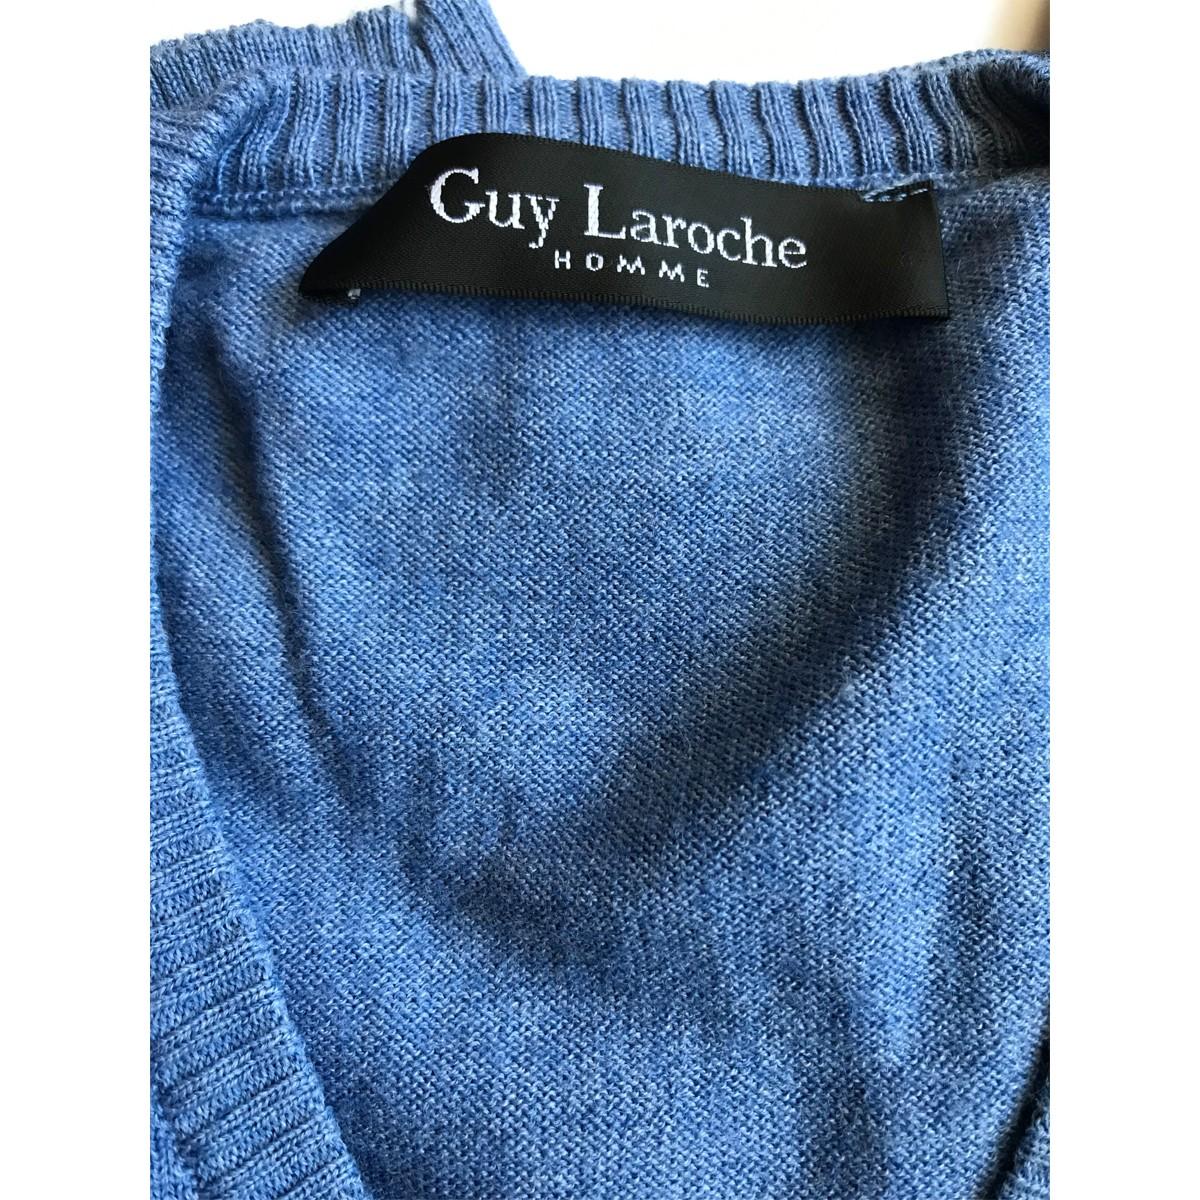 6b6e387d775 Guy Laroche Blue long sleeve V Neck top size XL